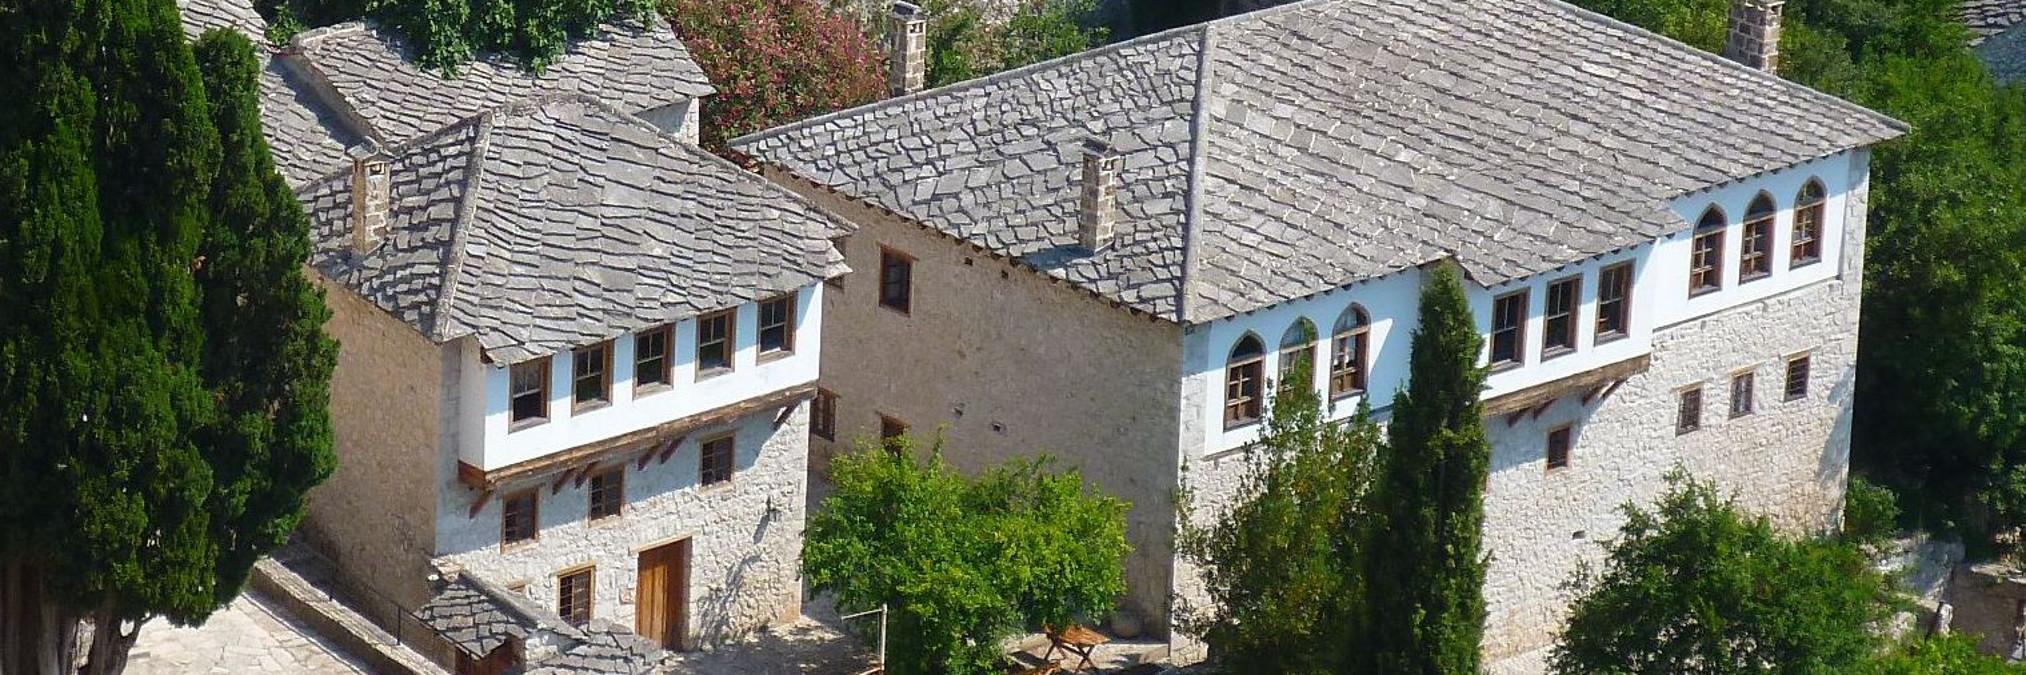 Дом Гавранкапетановича